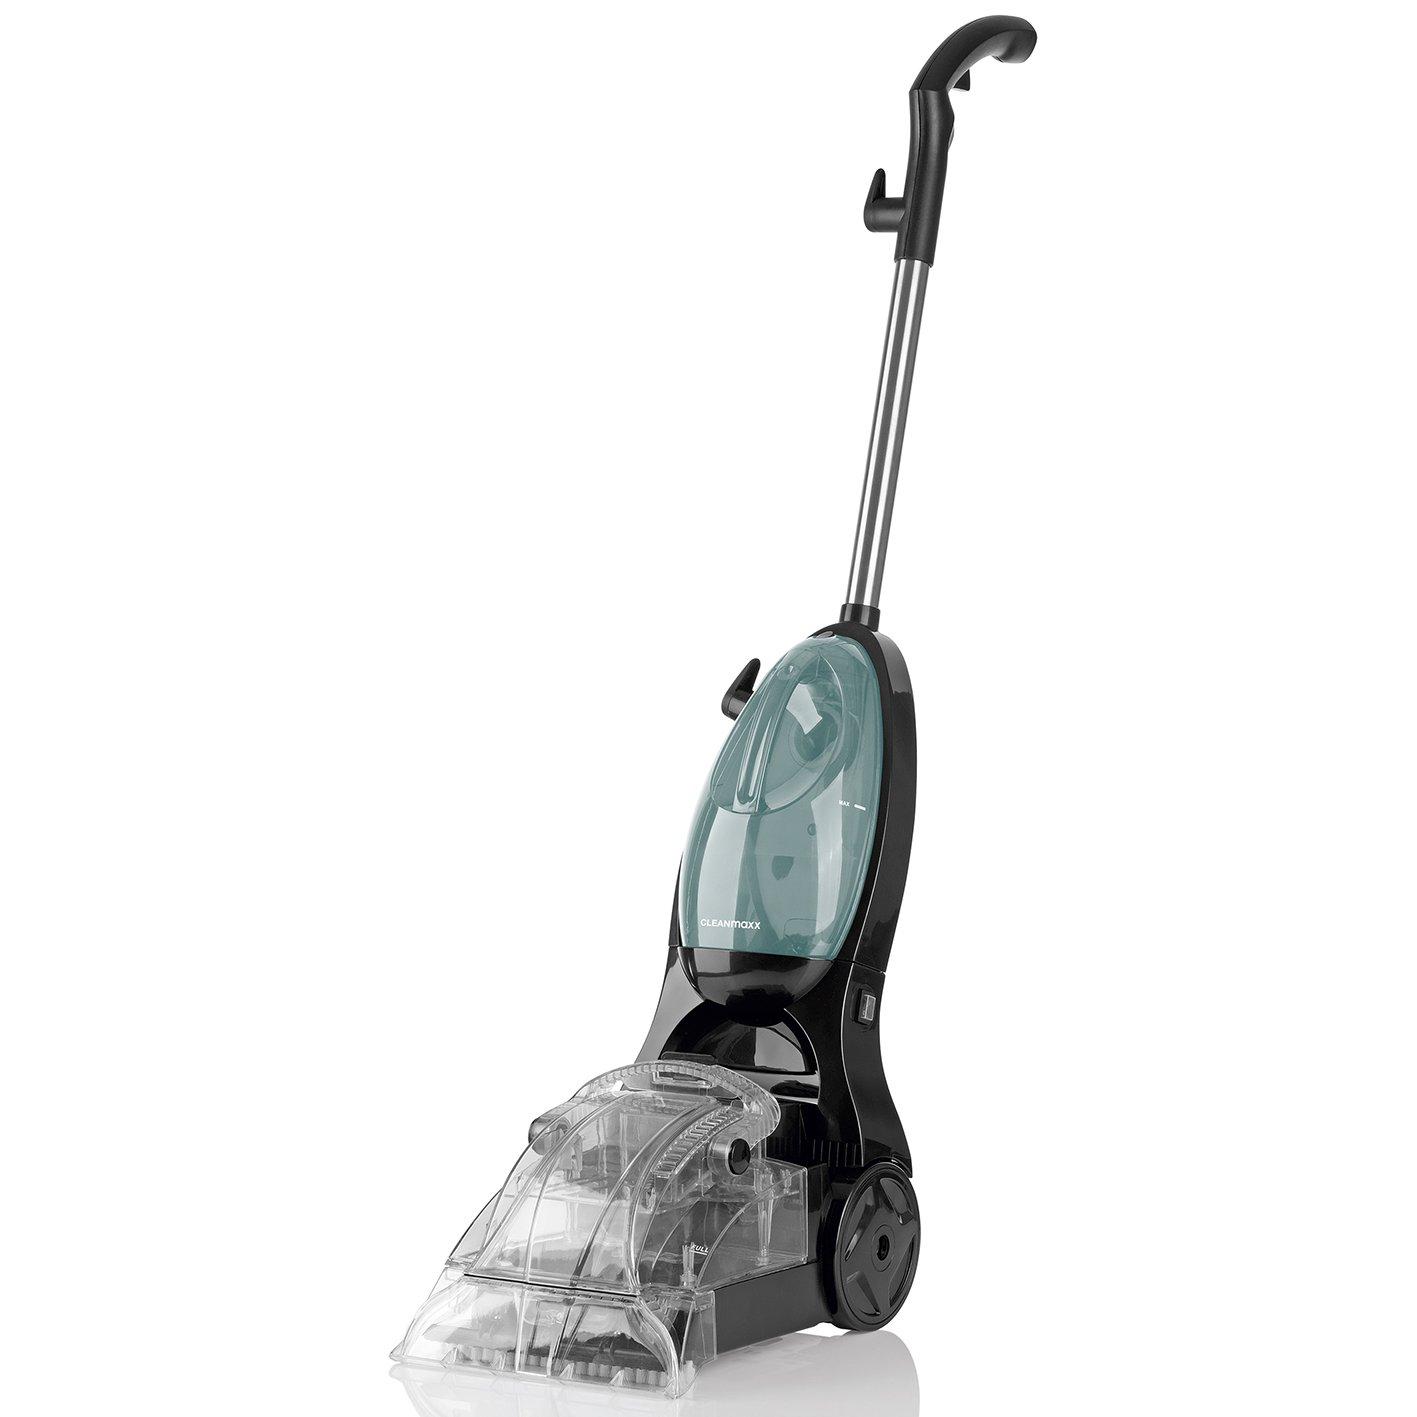 CLEANmaxx 05493 Aspirapolvere per tappeti | 500W | verde TV Unser Original 05493200199